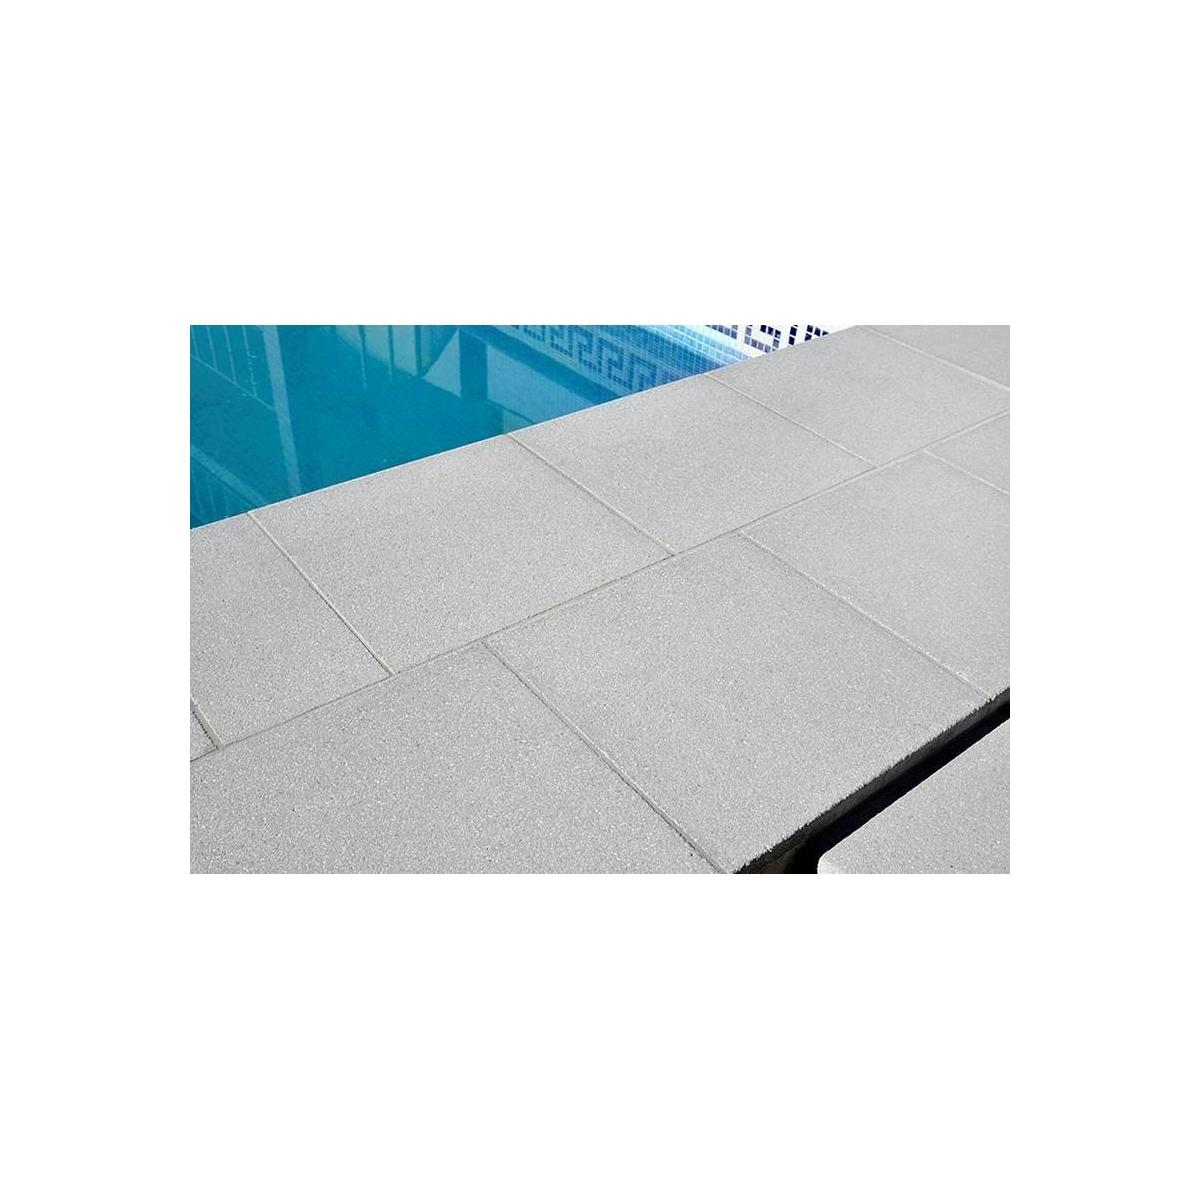 Borde de piscina escuadra Jerez Prefabricados López